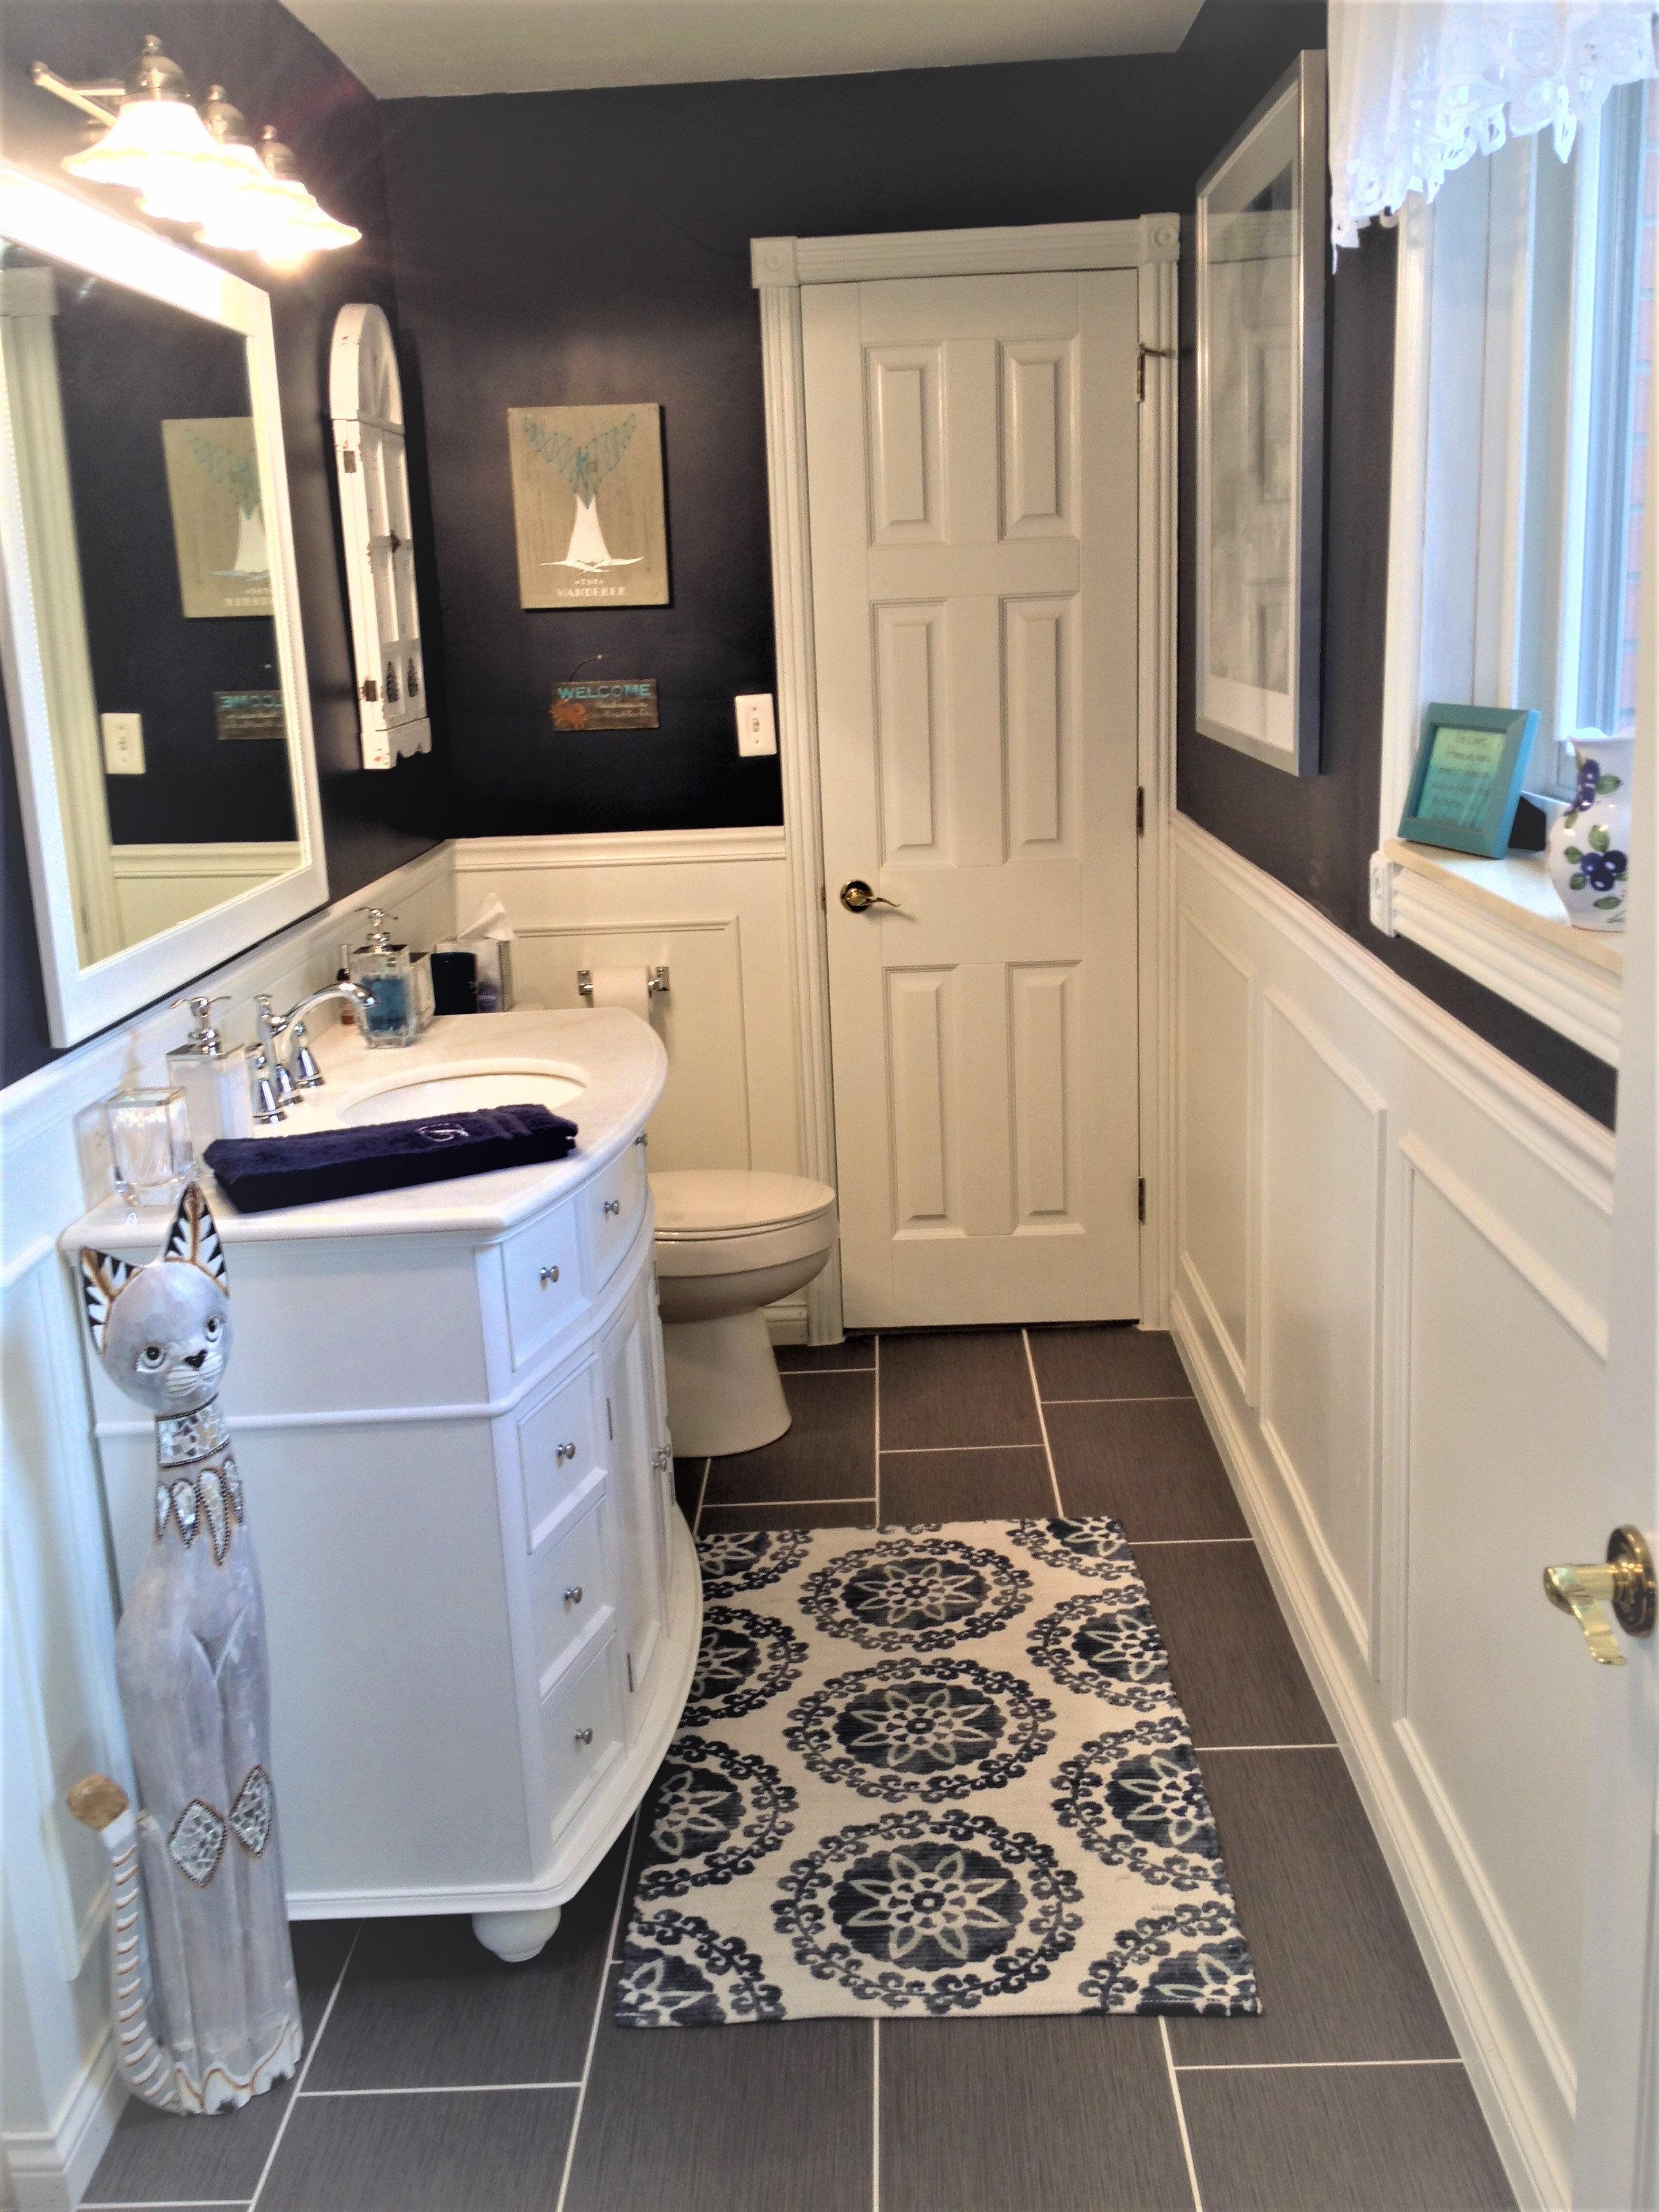 Bathroom On A Budget Remodelista, Bathroom On A Budget